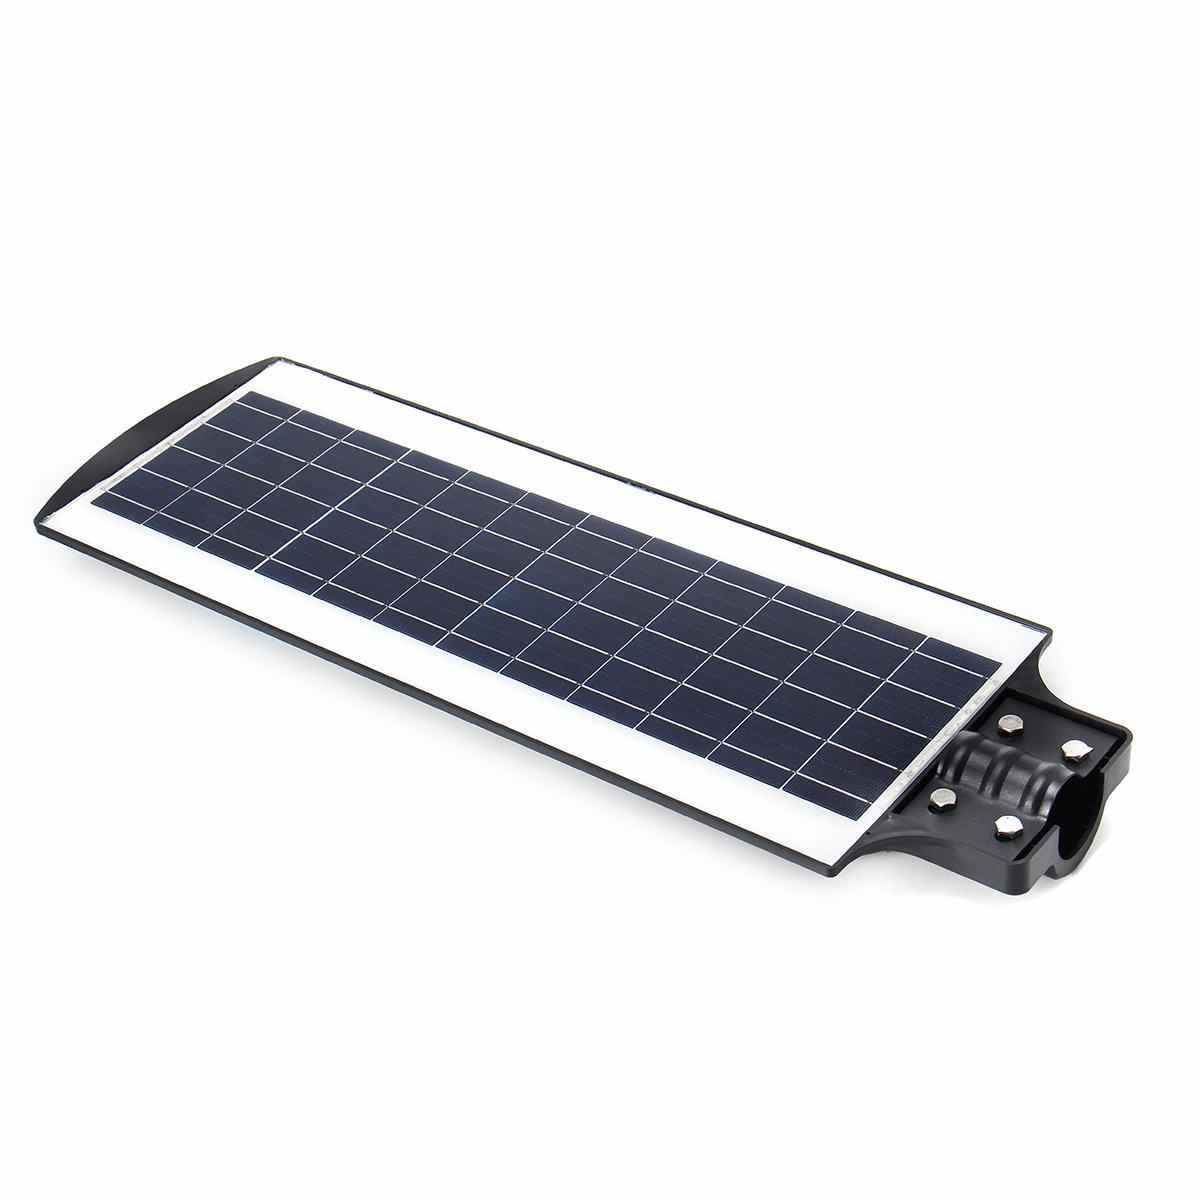 800W 320LED Solar Street Light PIR Motion Sensor Outdoor Wall Lamp Floodlight US